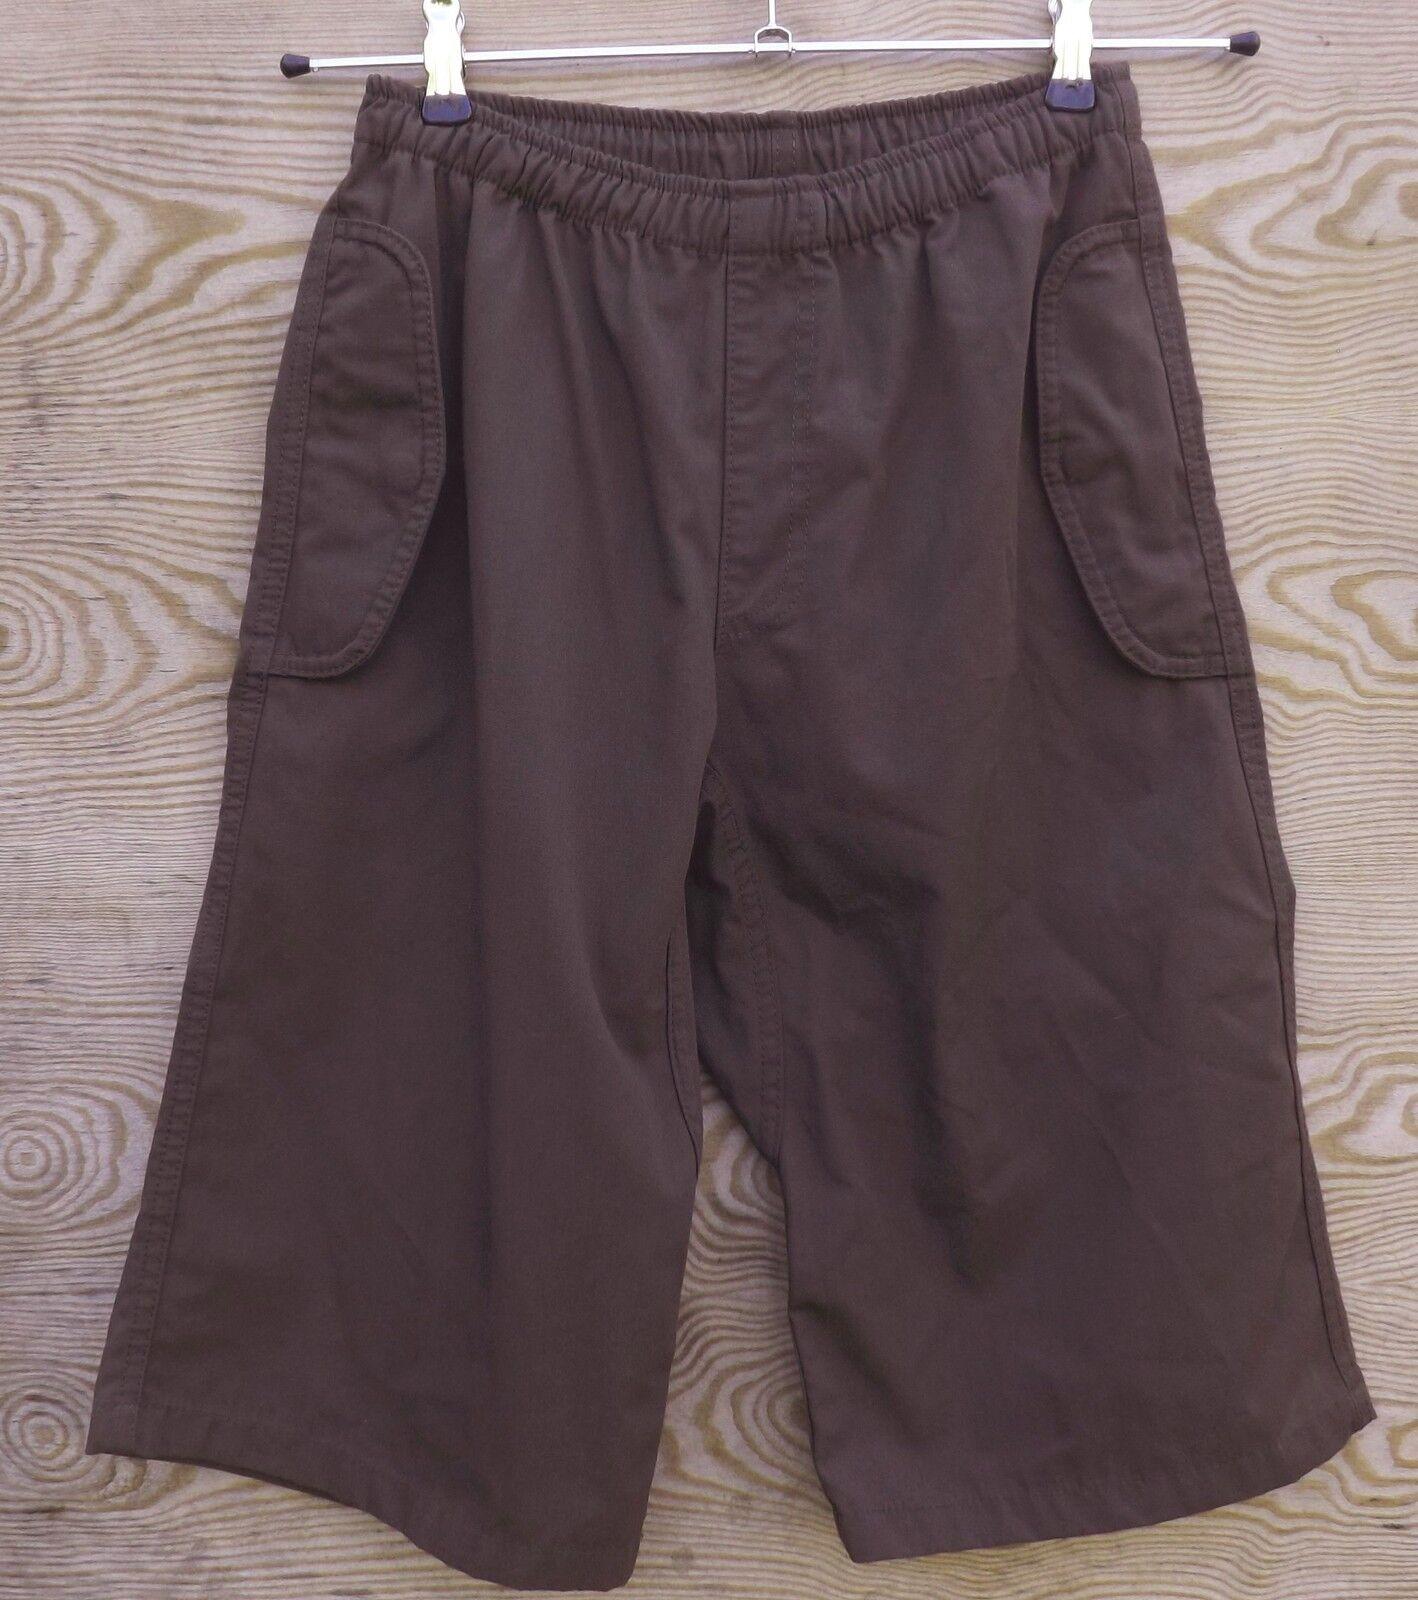 LUNA Cypher breve, Pantaloncini per uomini, Marronee